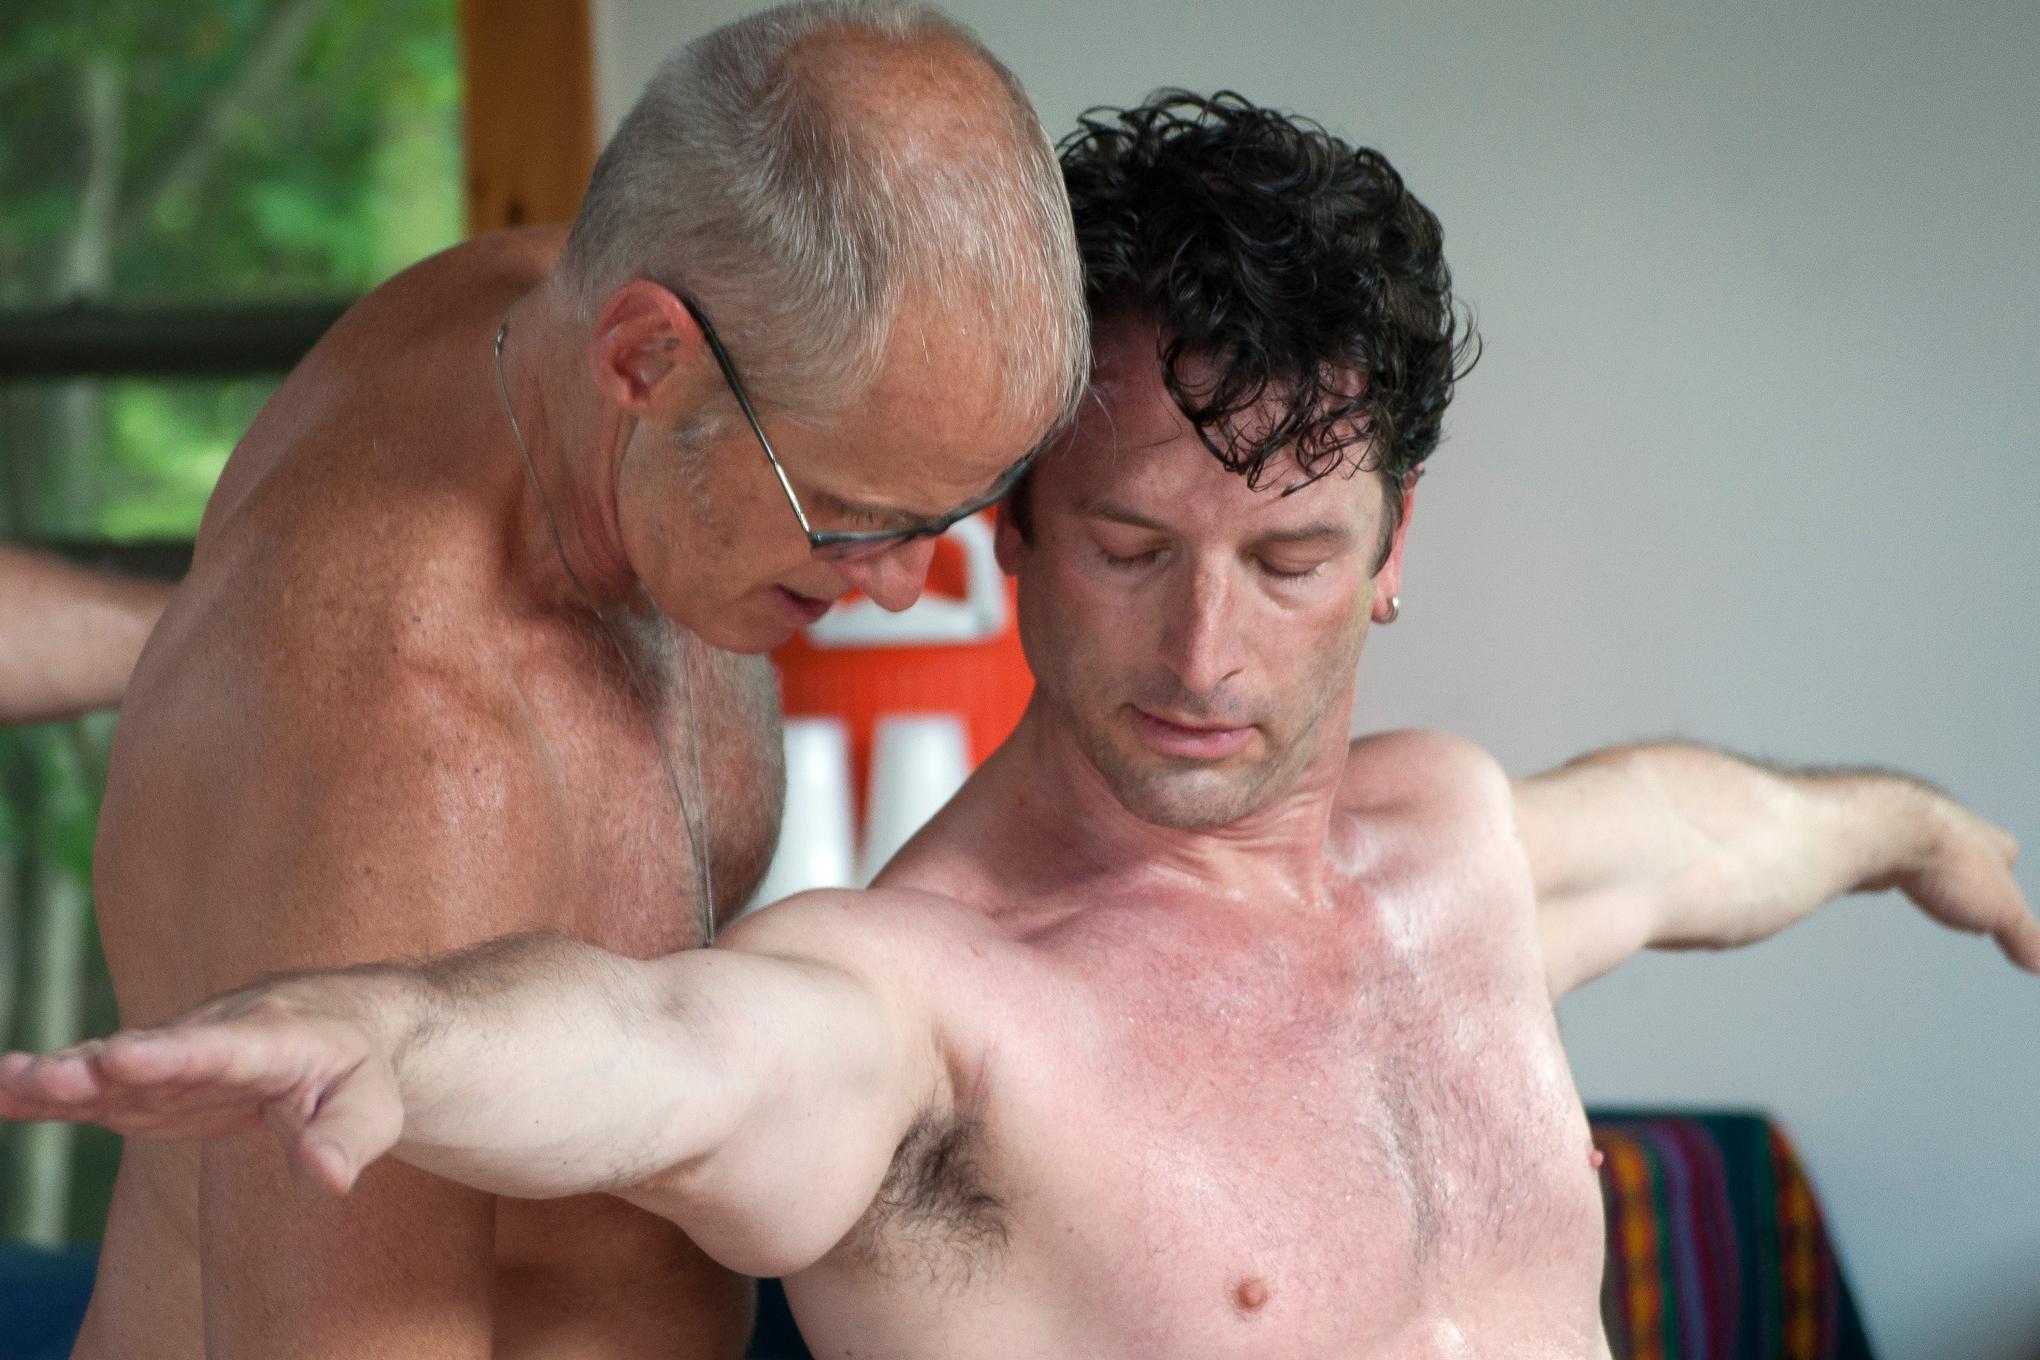 Two men practicing partnered yoga